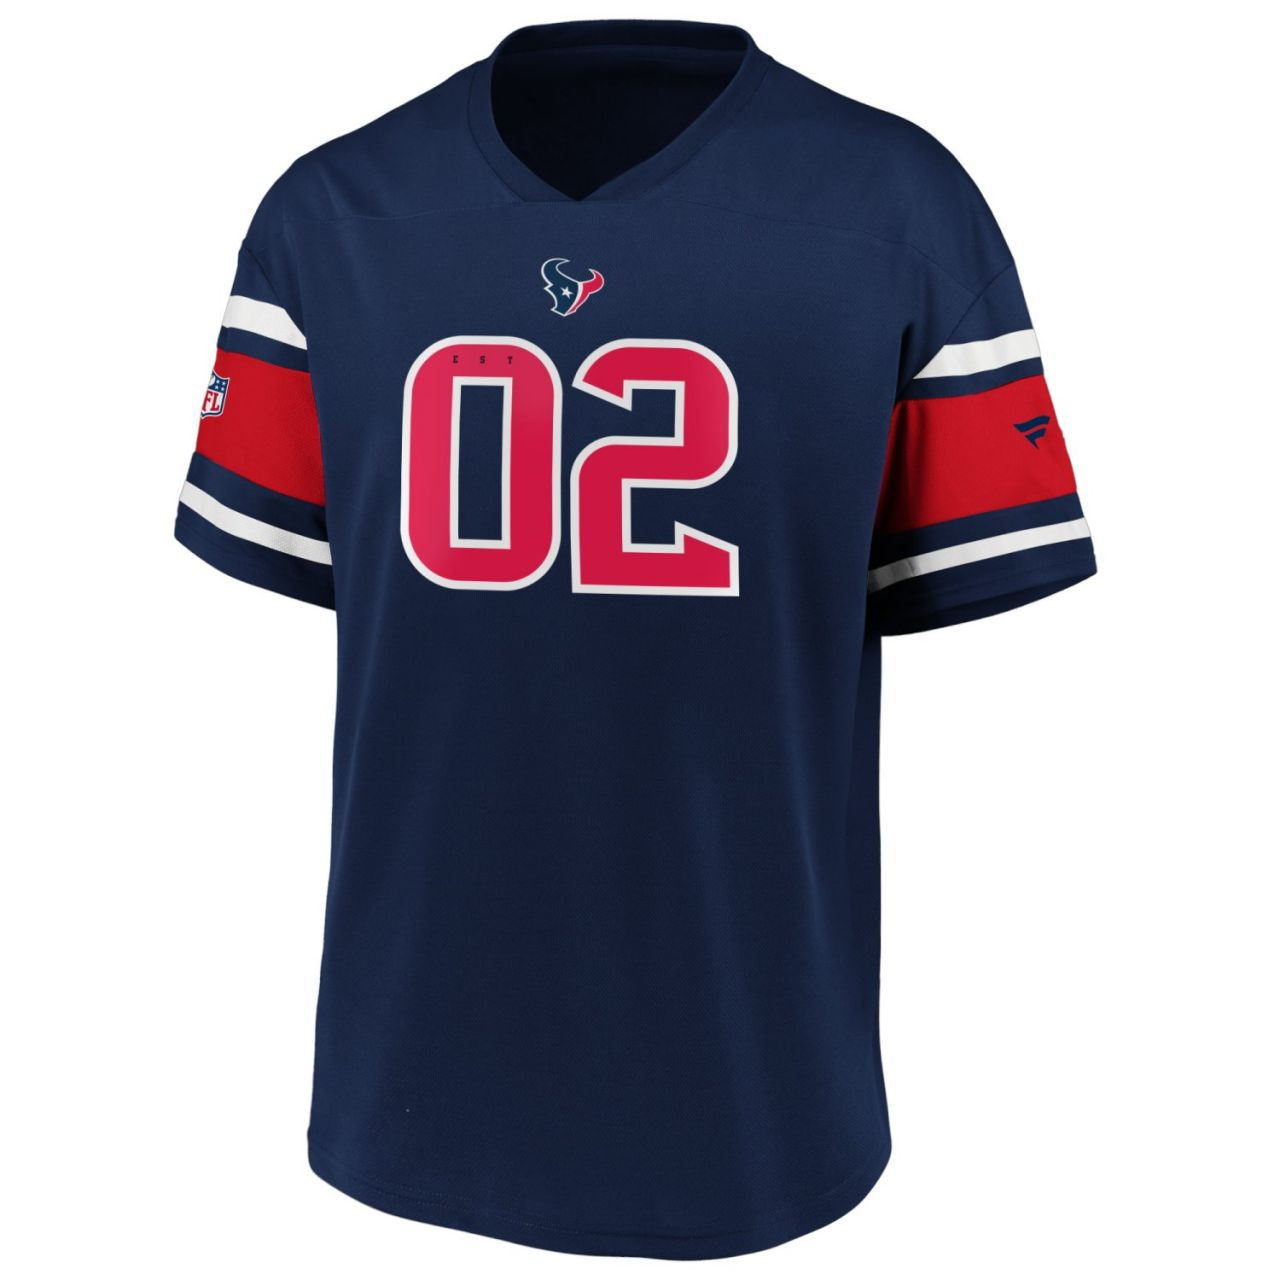 amfoo - Iconic Poly Mesh Supporters Jersey Trikot - Houston Texans